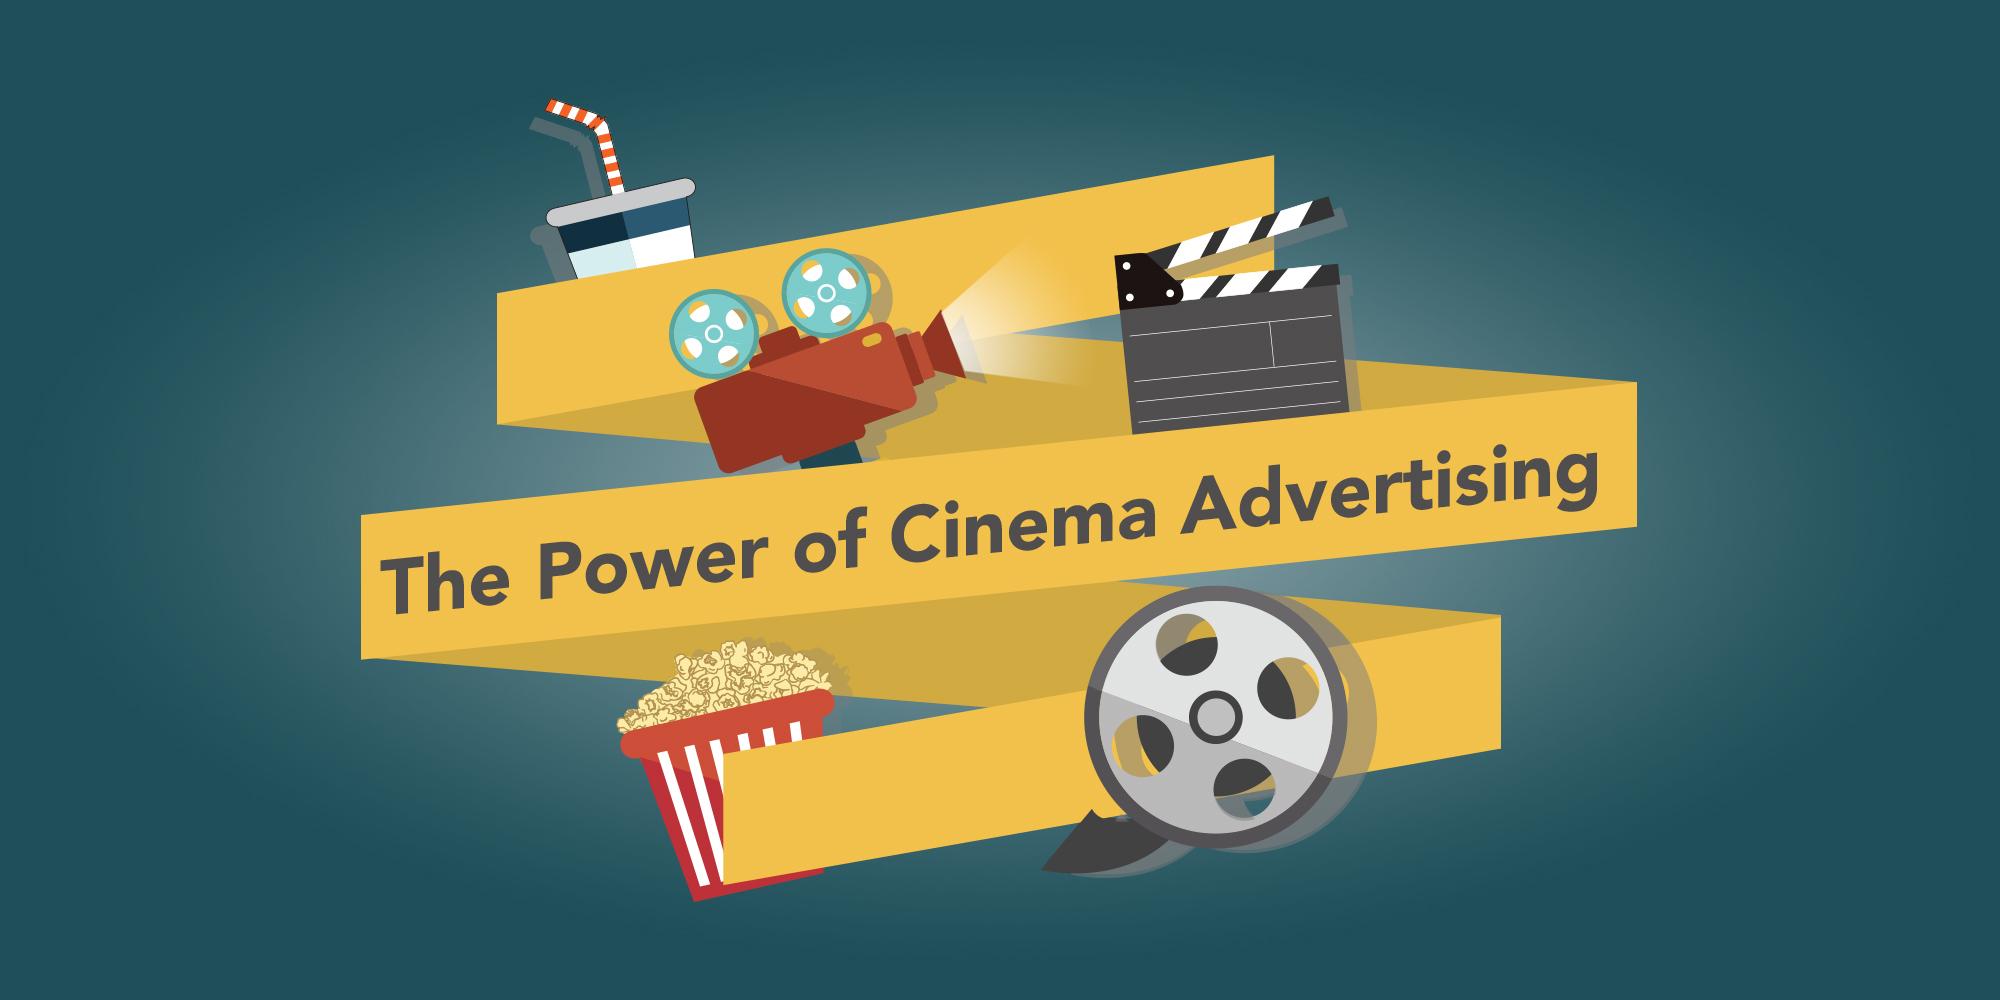 psychographics in cinema advertising